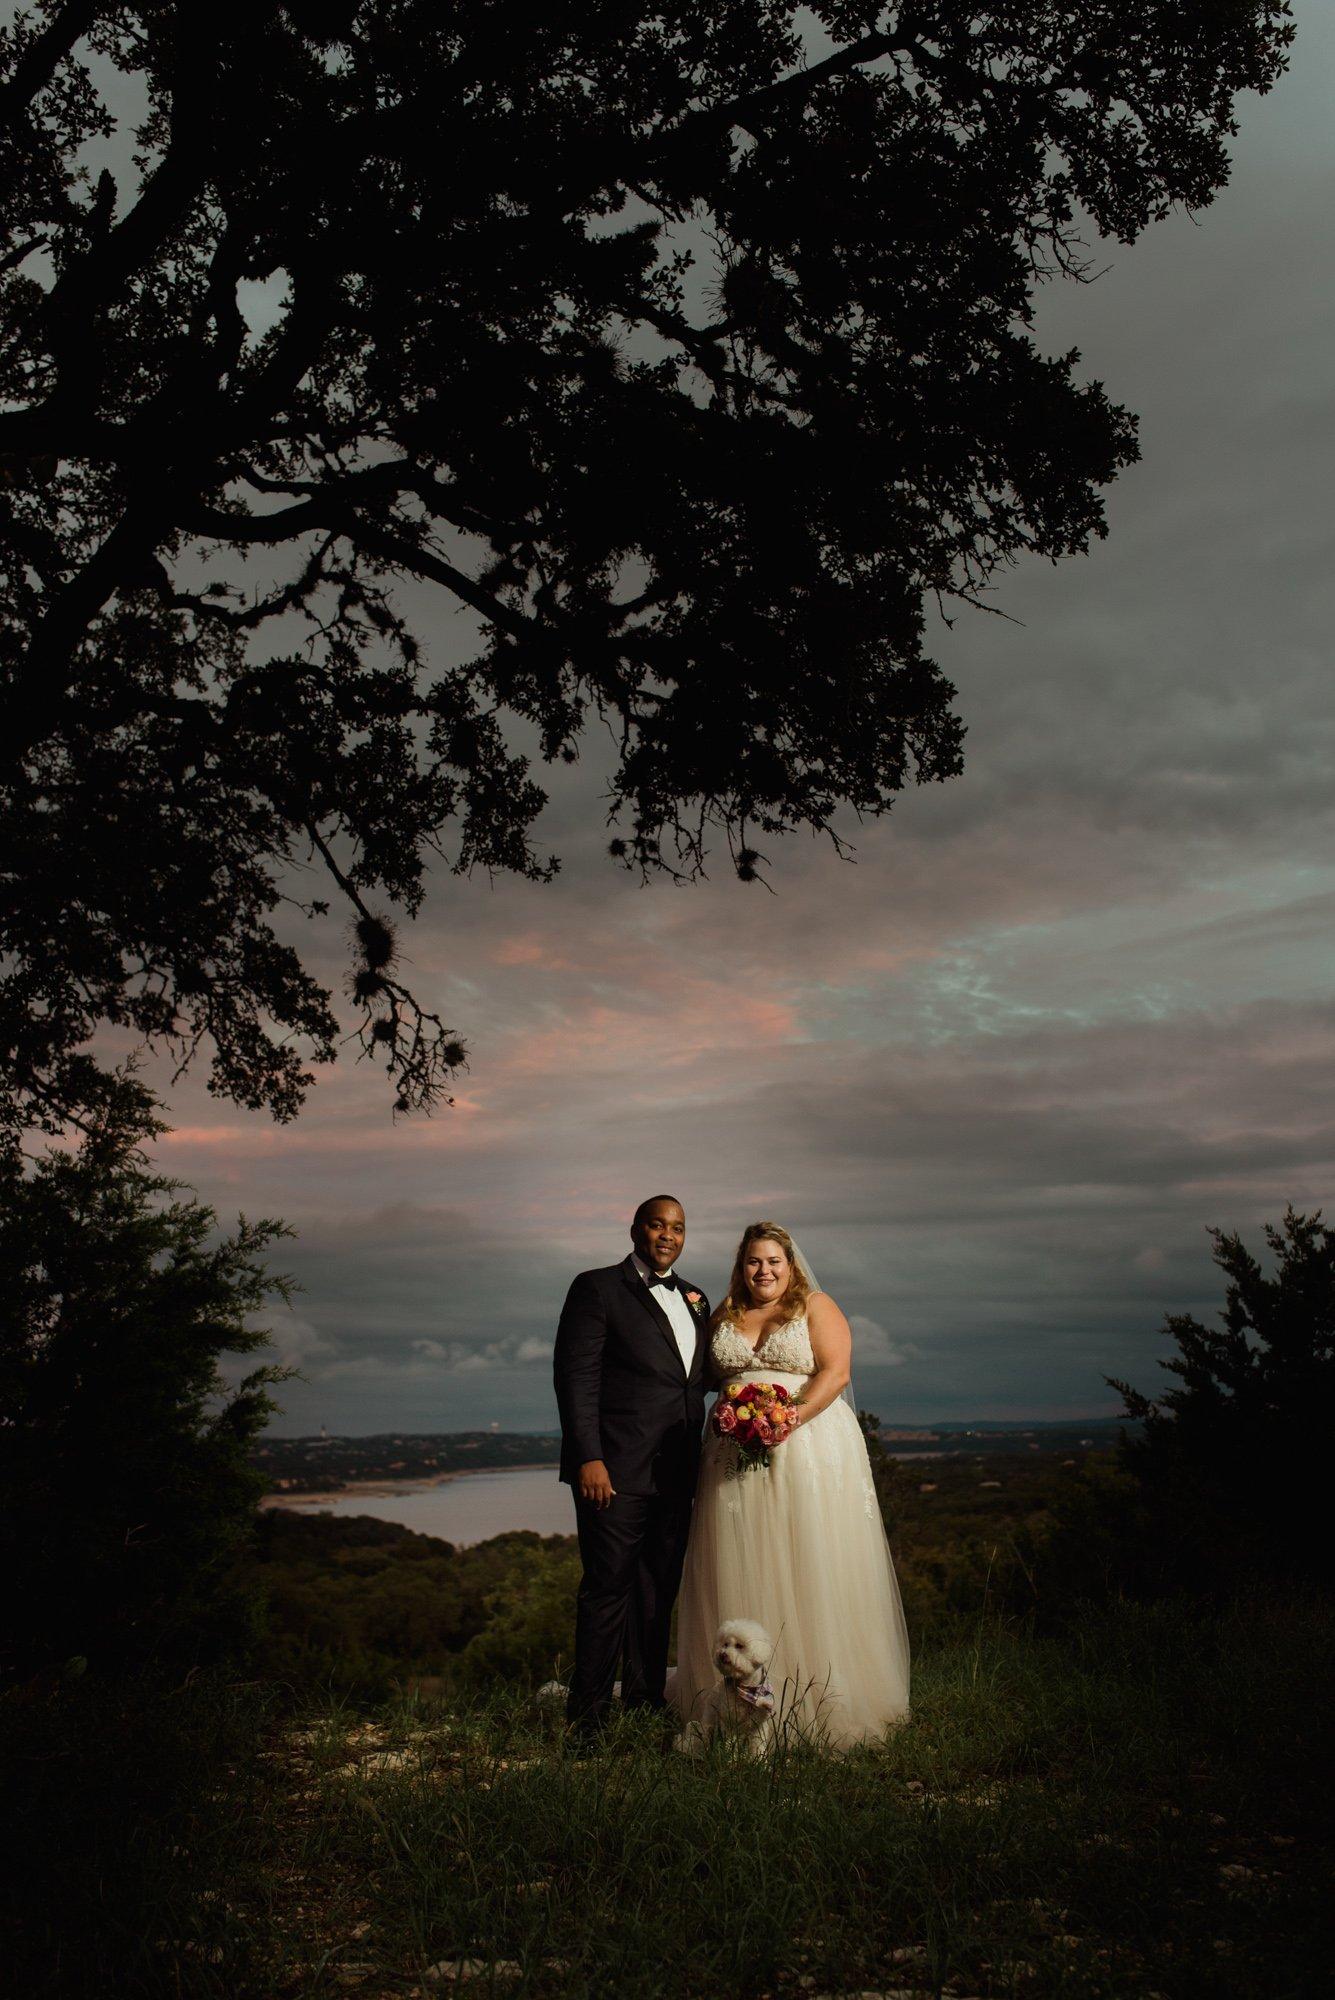 creative, offbeat, austin wedding photographer, off camera lighting portraits, wedding portraits after sunset, fall wedding overlooking lake austin, texas mini wedding photographer